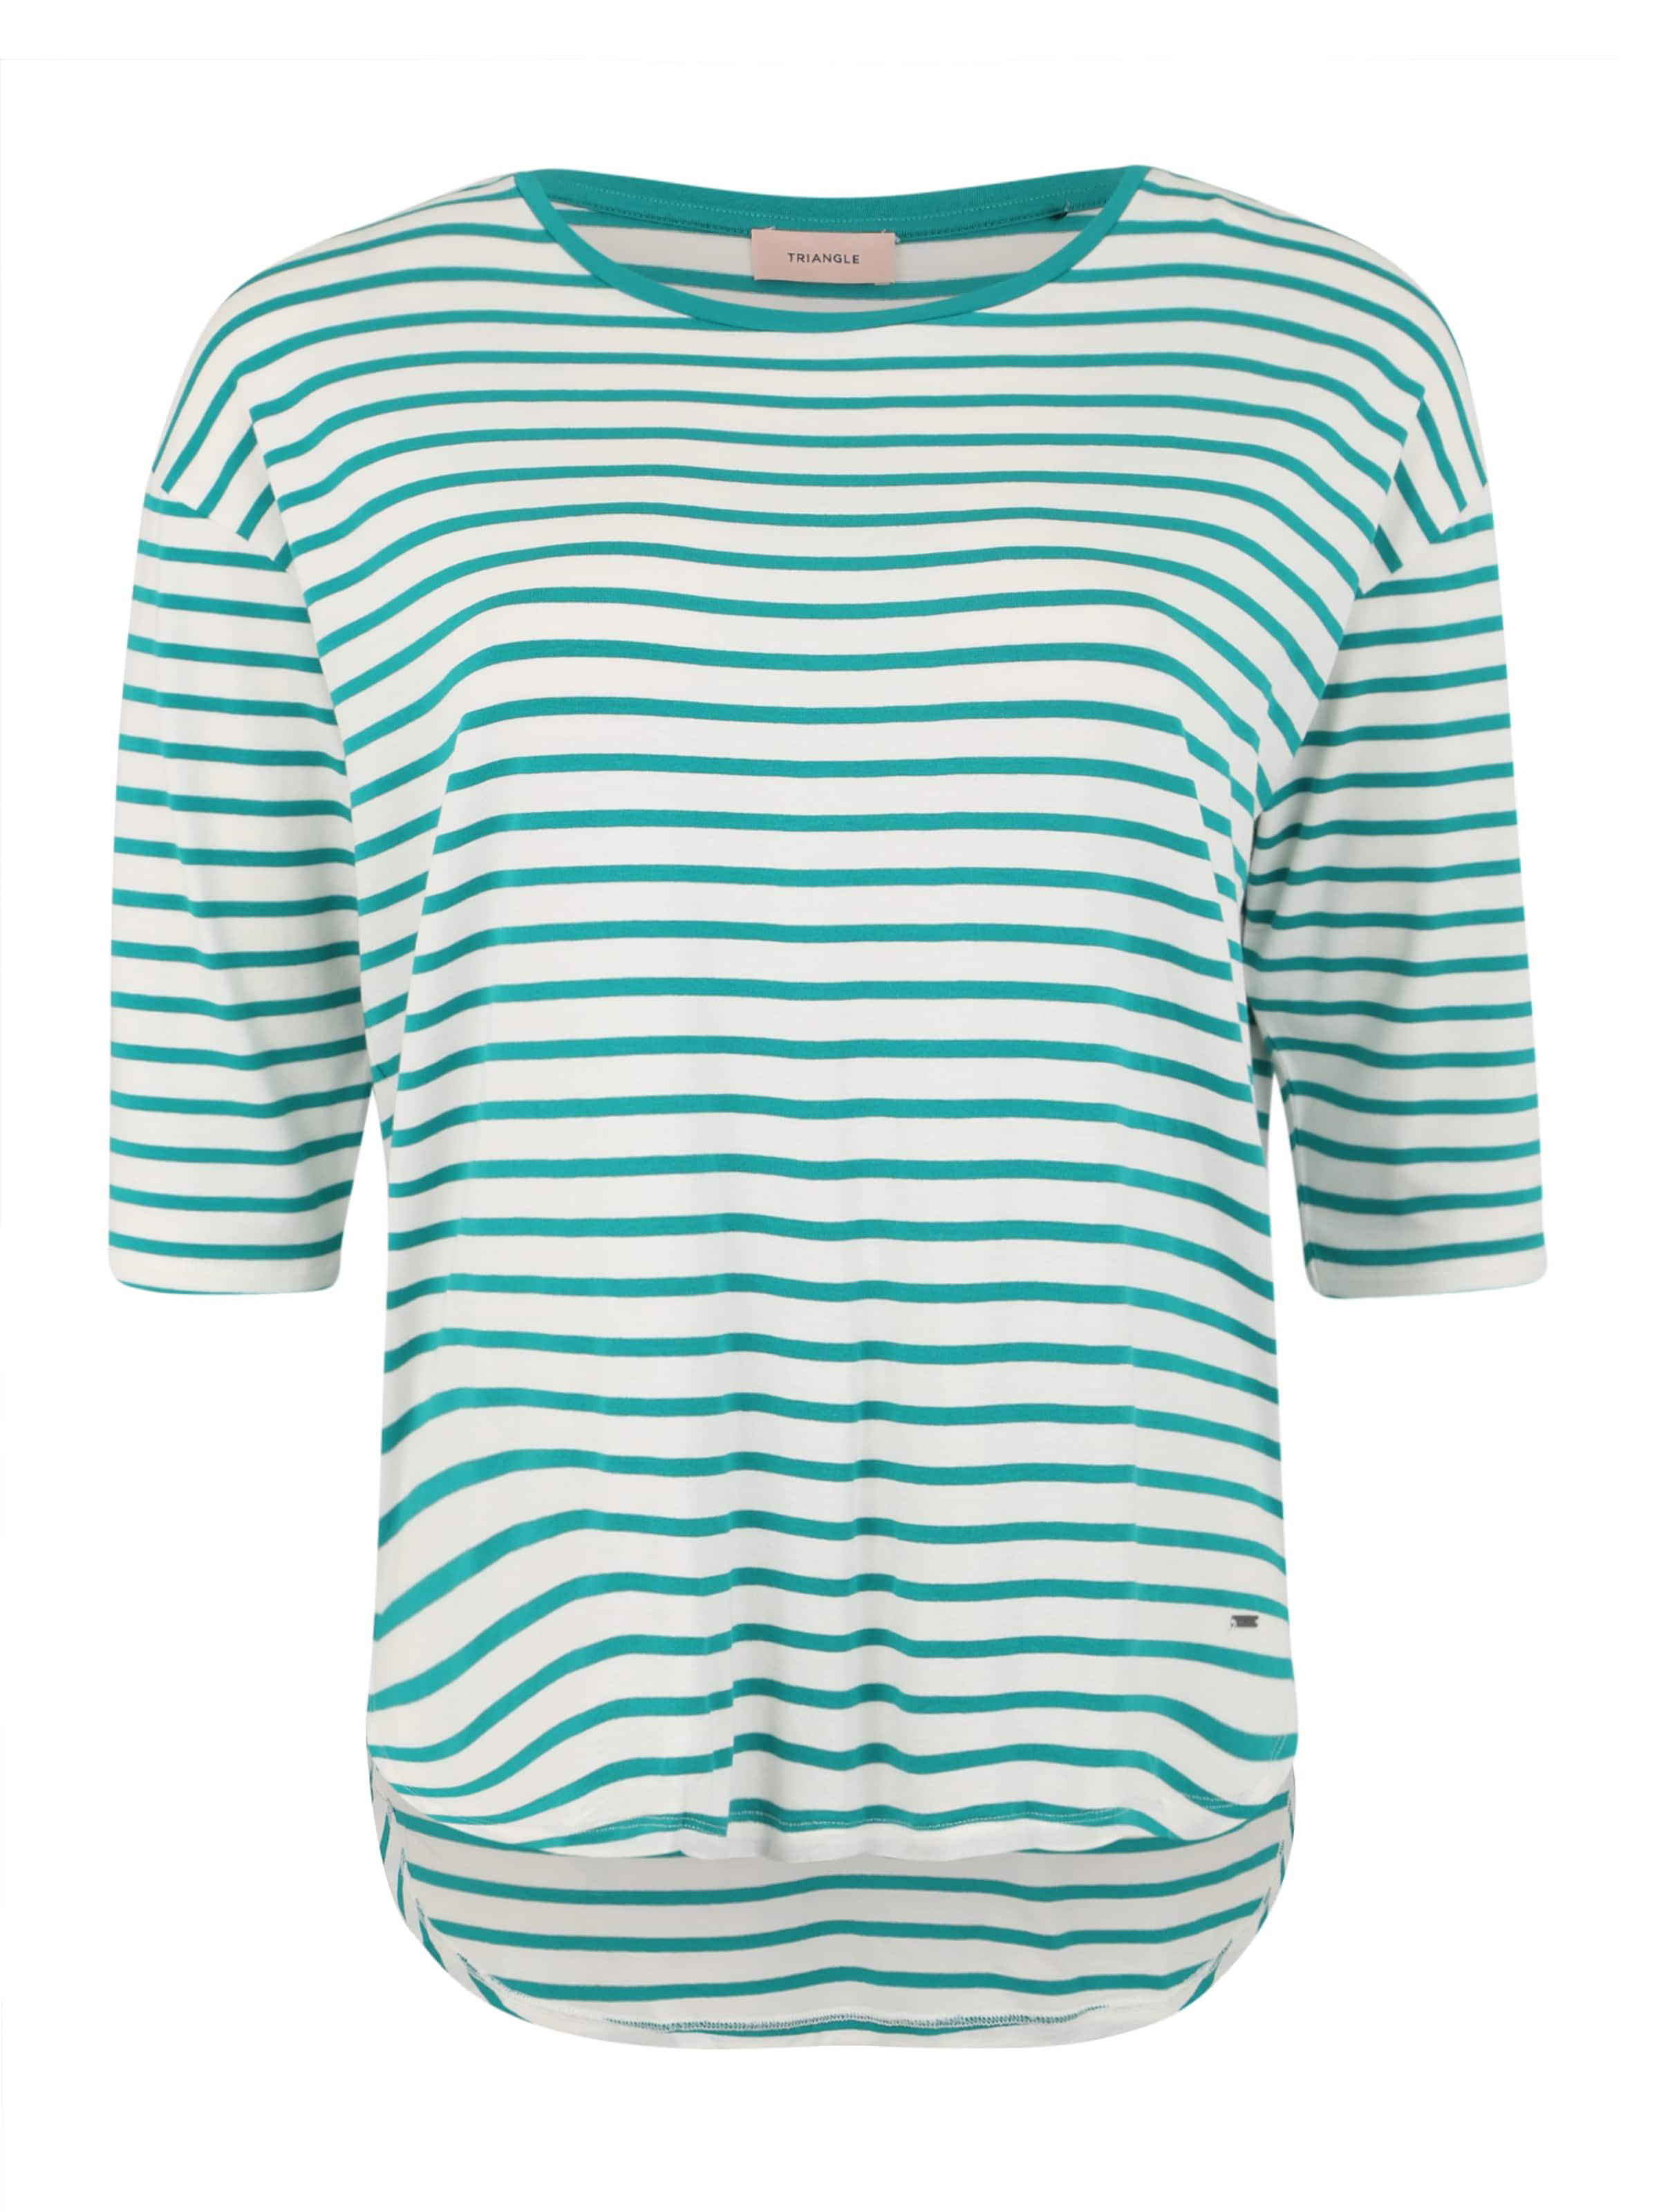 Bleu En Marine shirt T Triangle v0P8OmNnyw